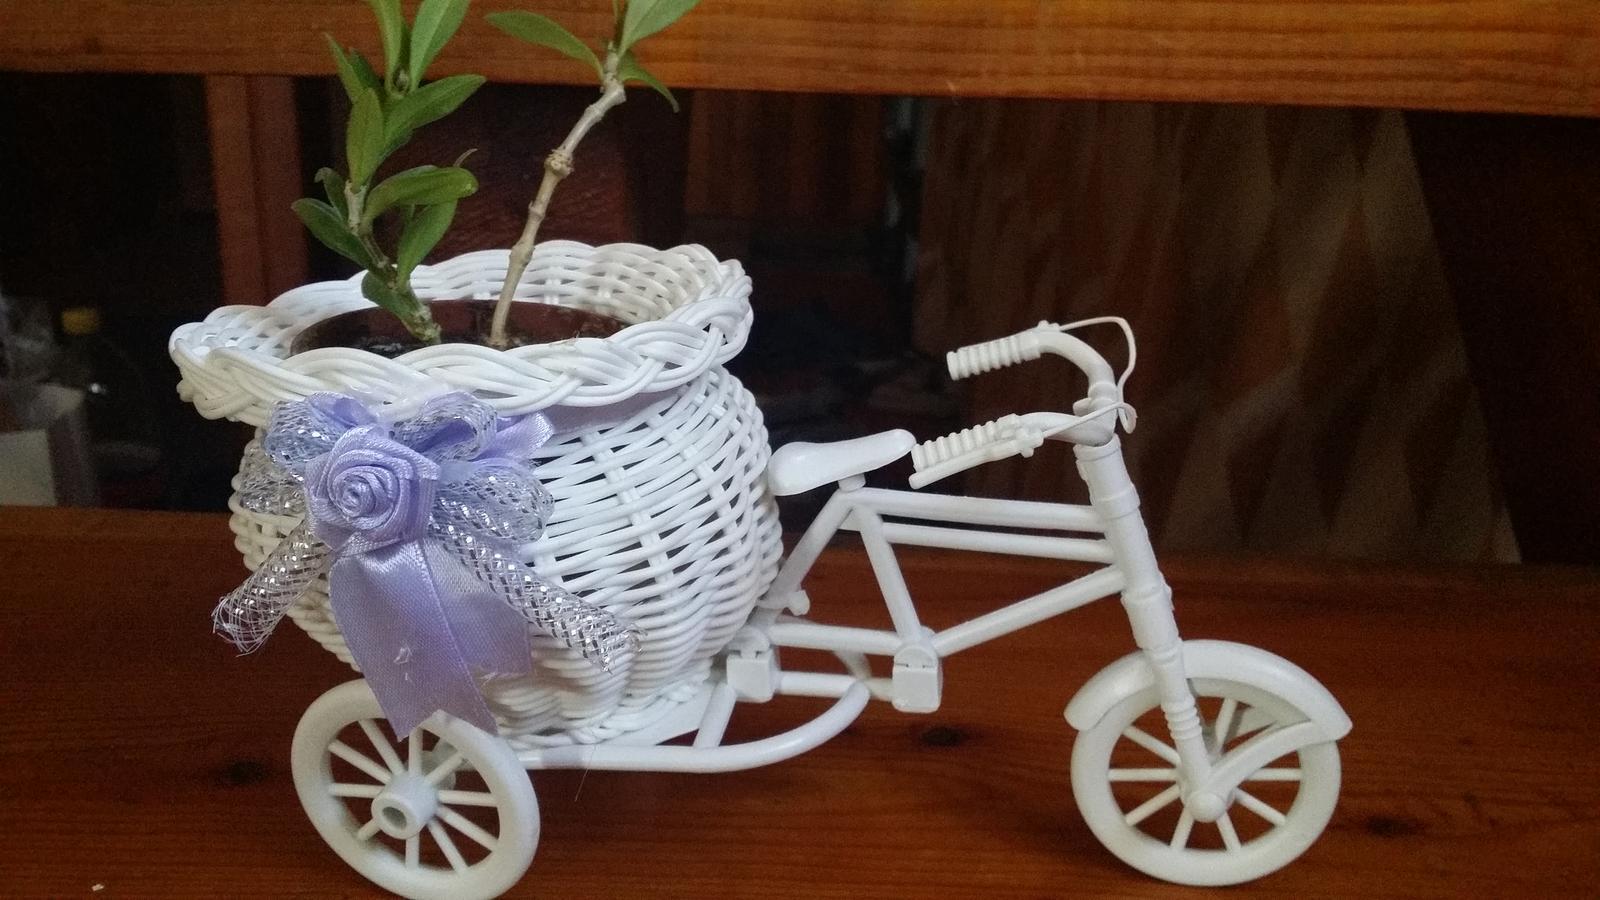 Stojan na kvety, vazu, sviecku, bicykel, trojkolka - Obrázok č. 1